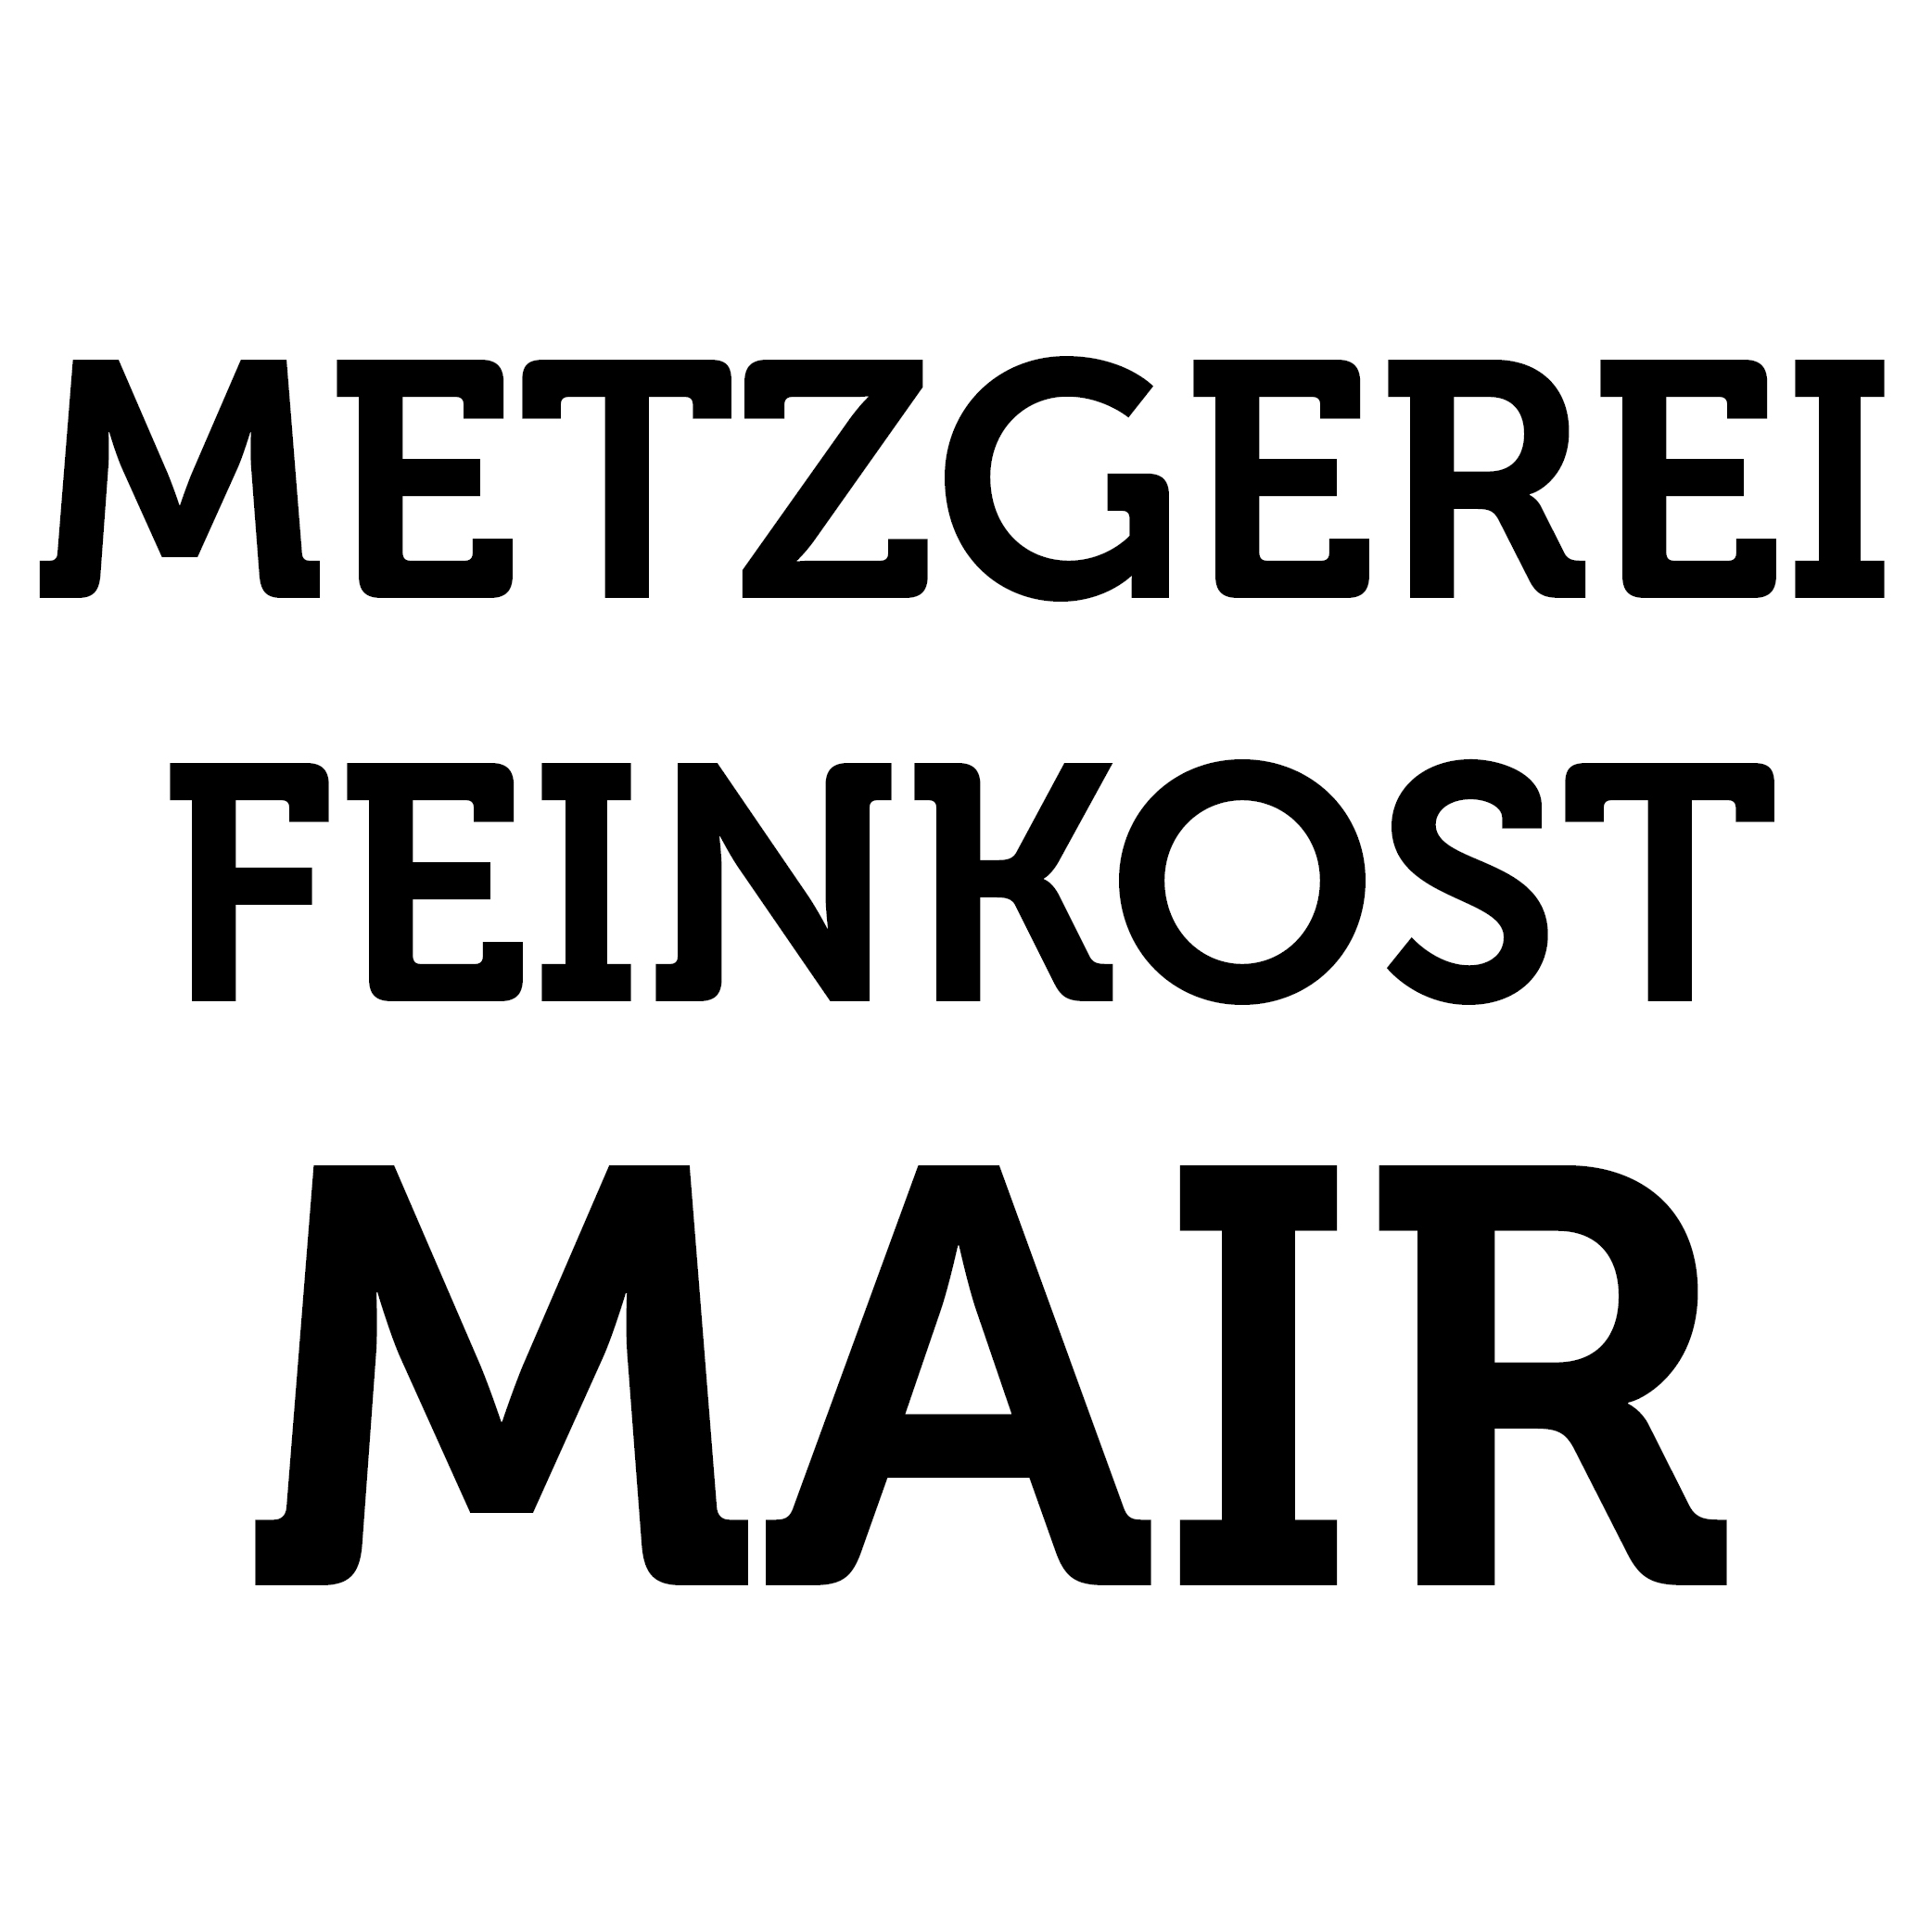 Metzgerei & Feinkost Mair